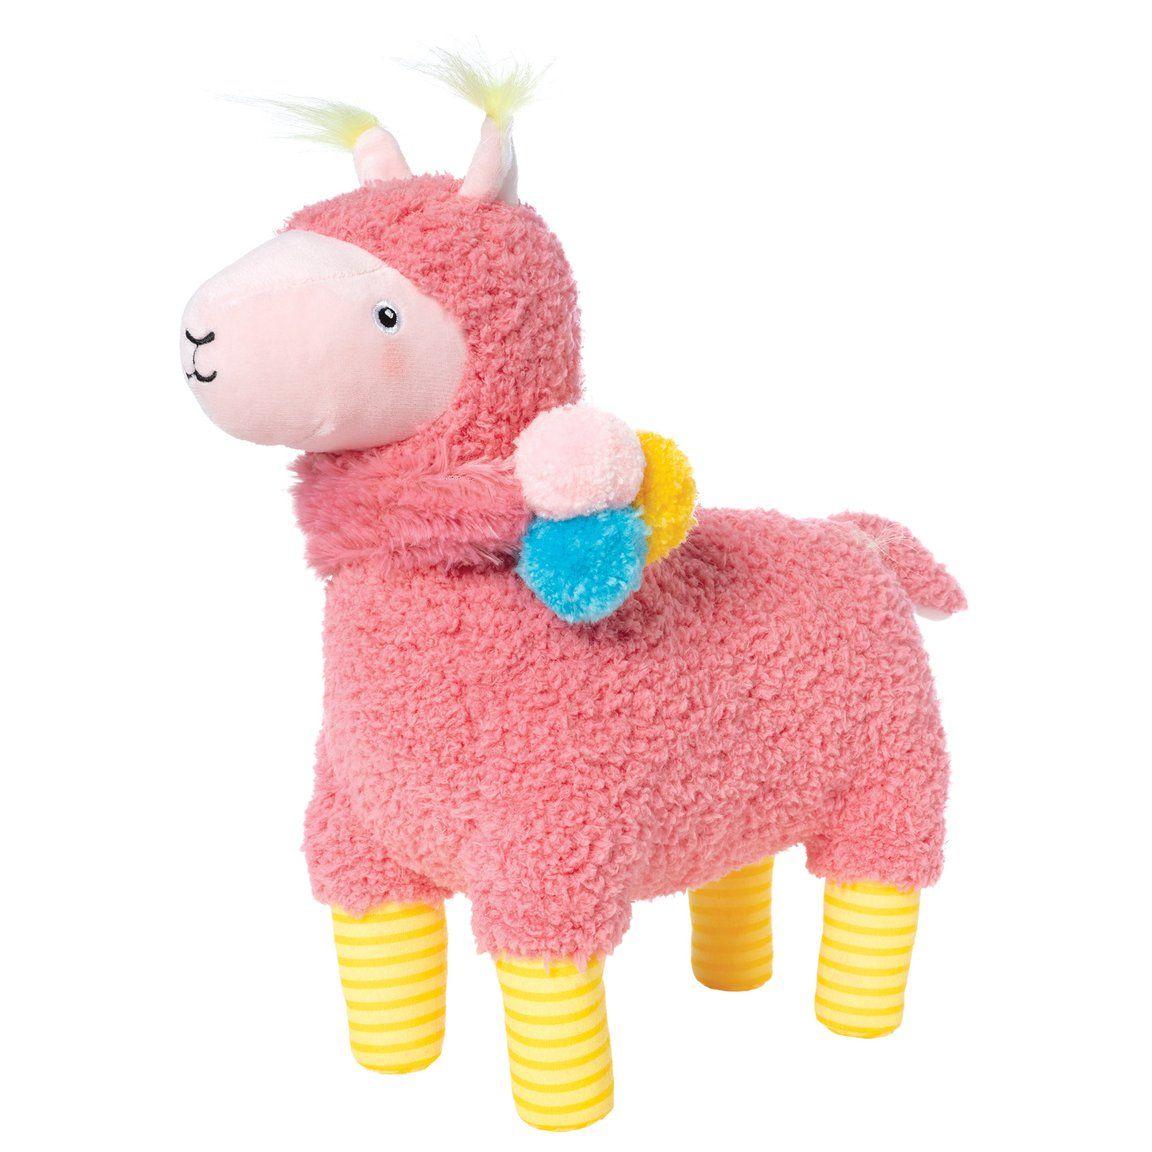 Amigos llama pink kids wear dinosaur stuffed animal